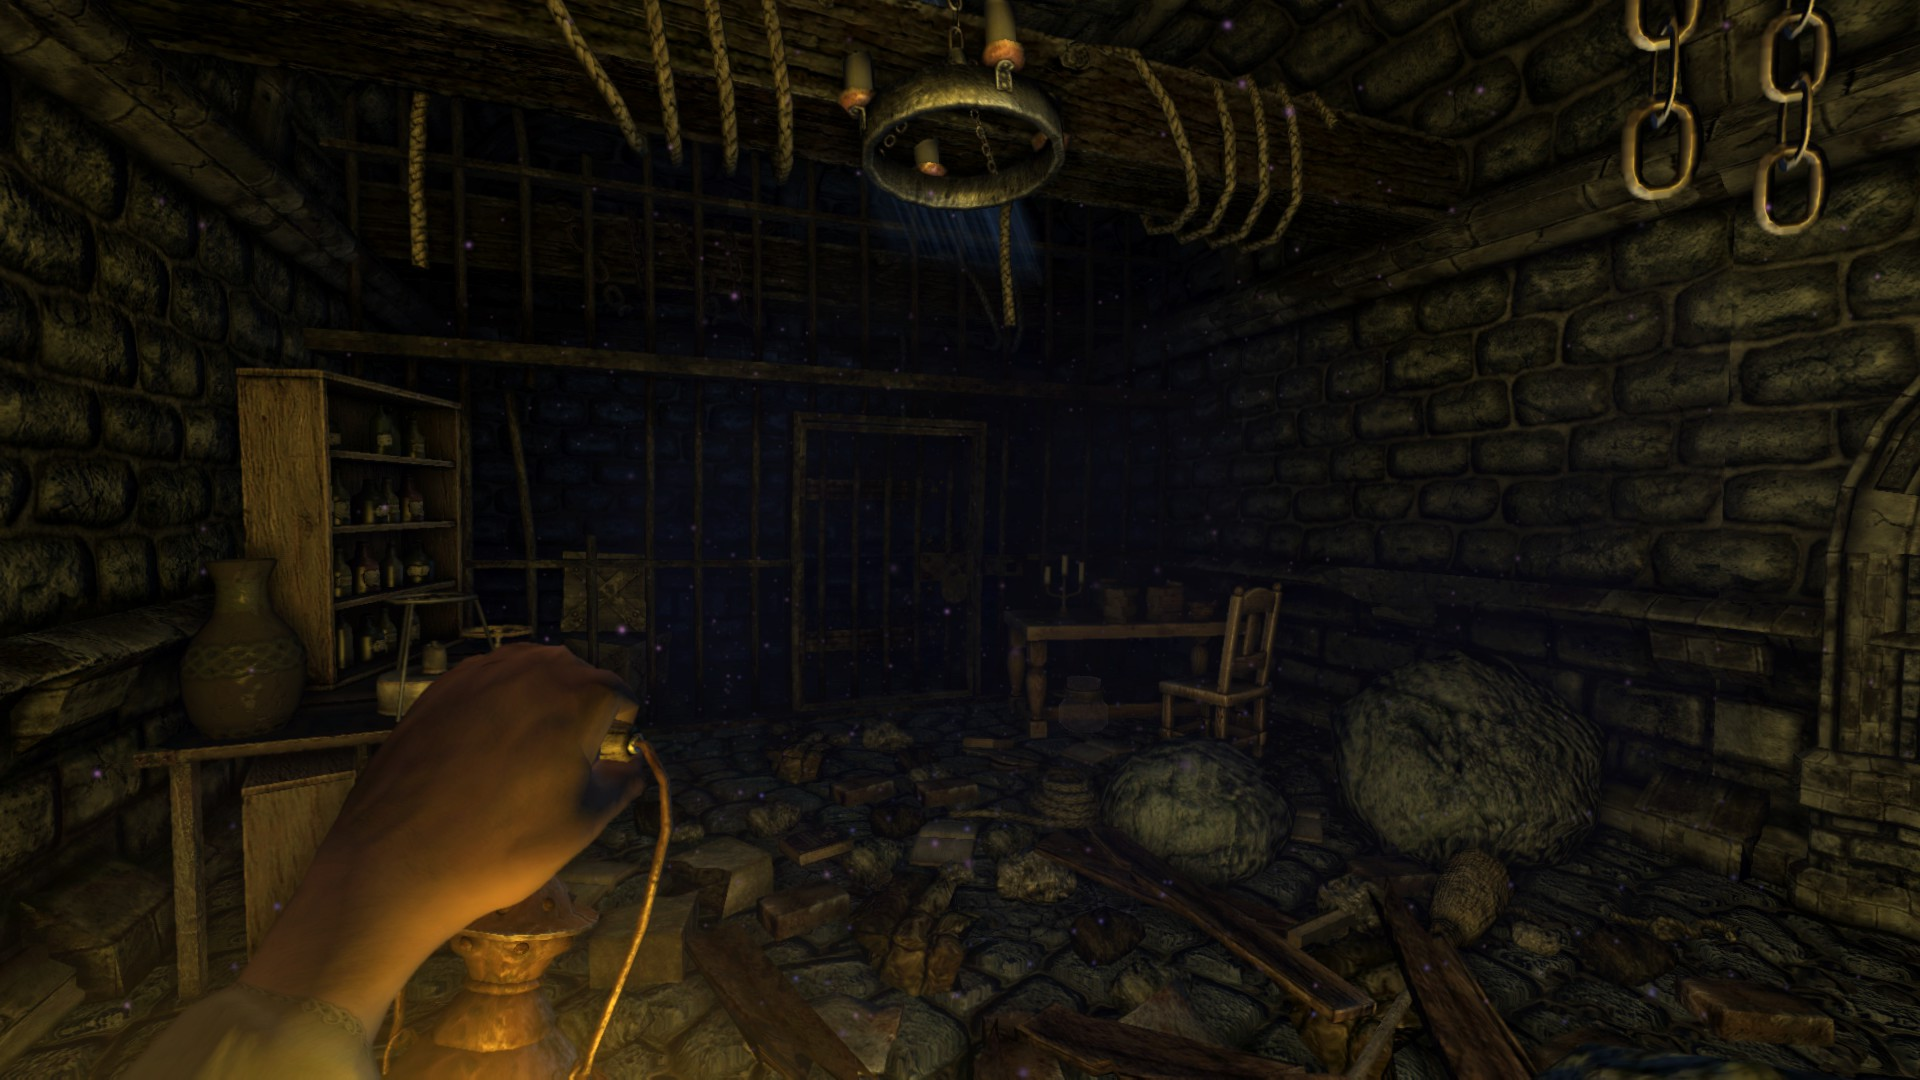 Lab Image Antiquity Mod For Amnesia The Dark Descent Mod Db